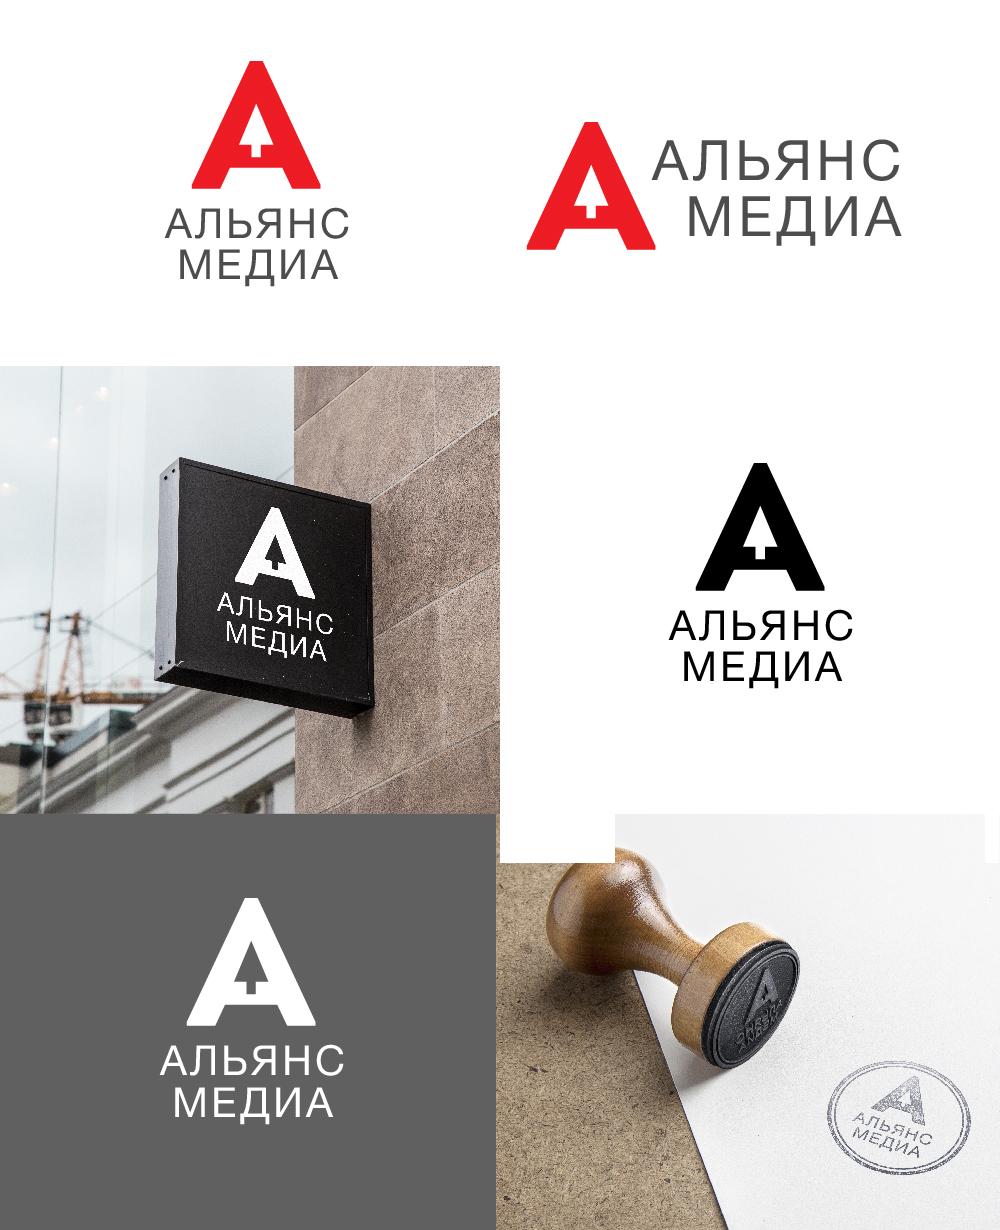 Создать логотип для компании фото f_7155ab13c492f3f2.jpg